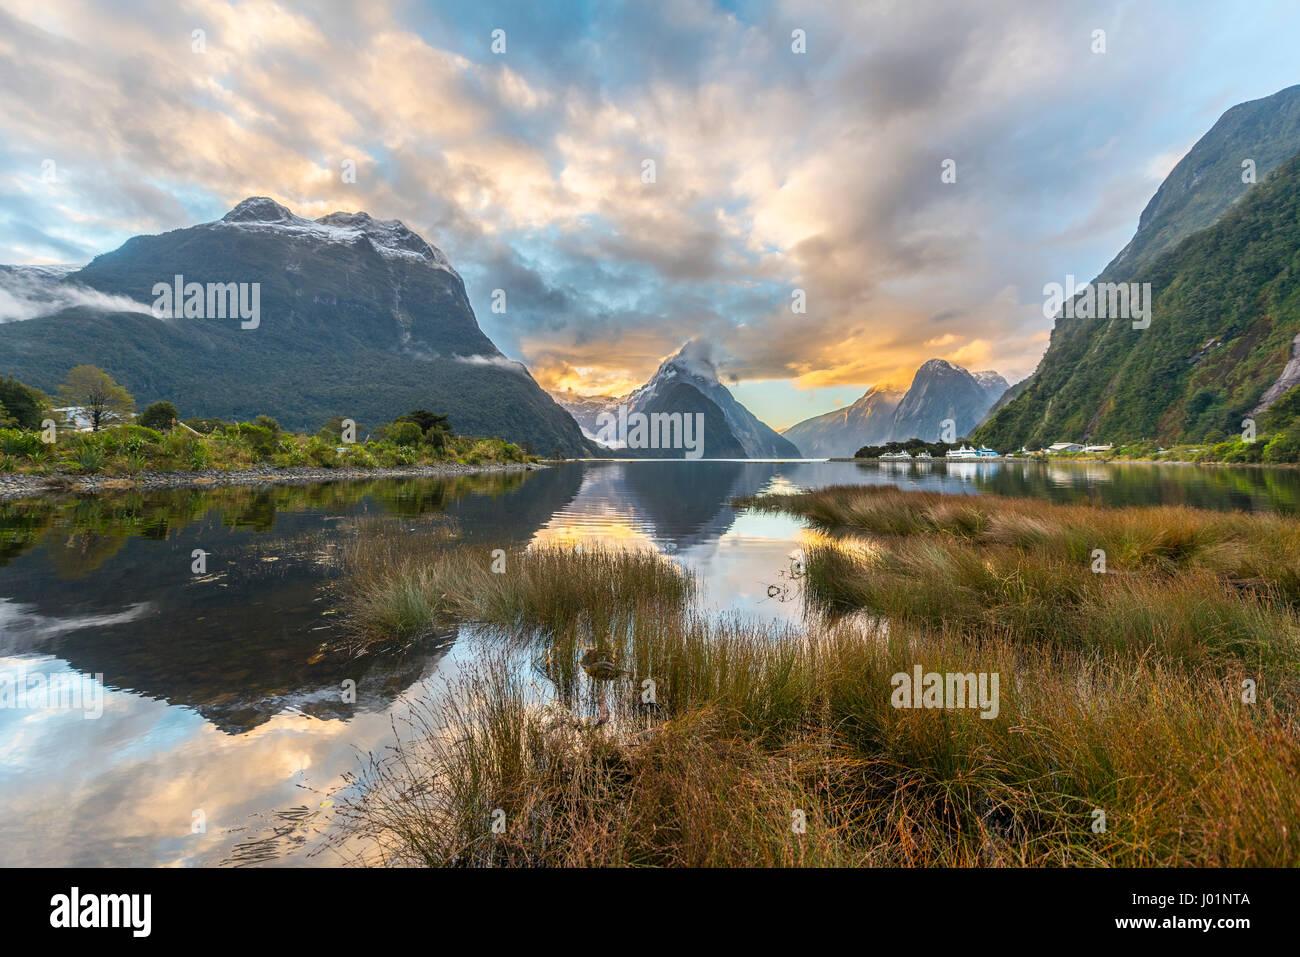 Mitre Peak Reflexion im Wasser, Sonnenuntergang, Milford Sound, Fiordland-Nationalpark, Te Anau, Southland Region Stockbild